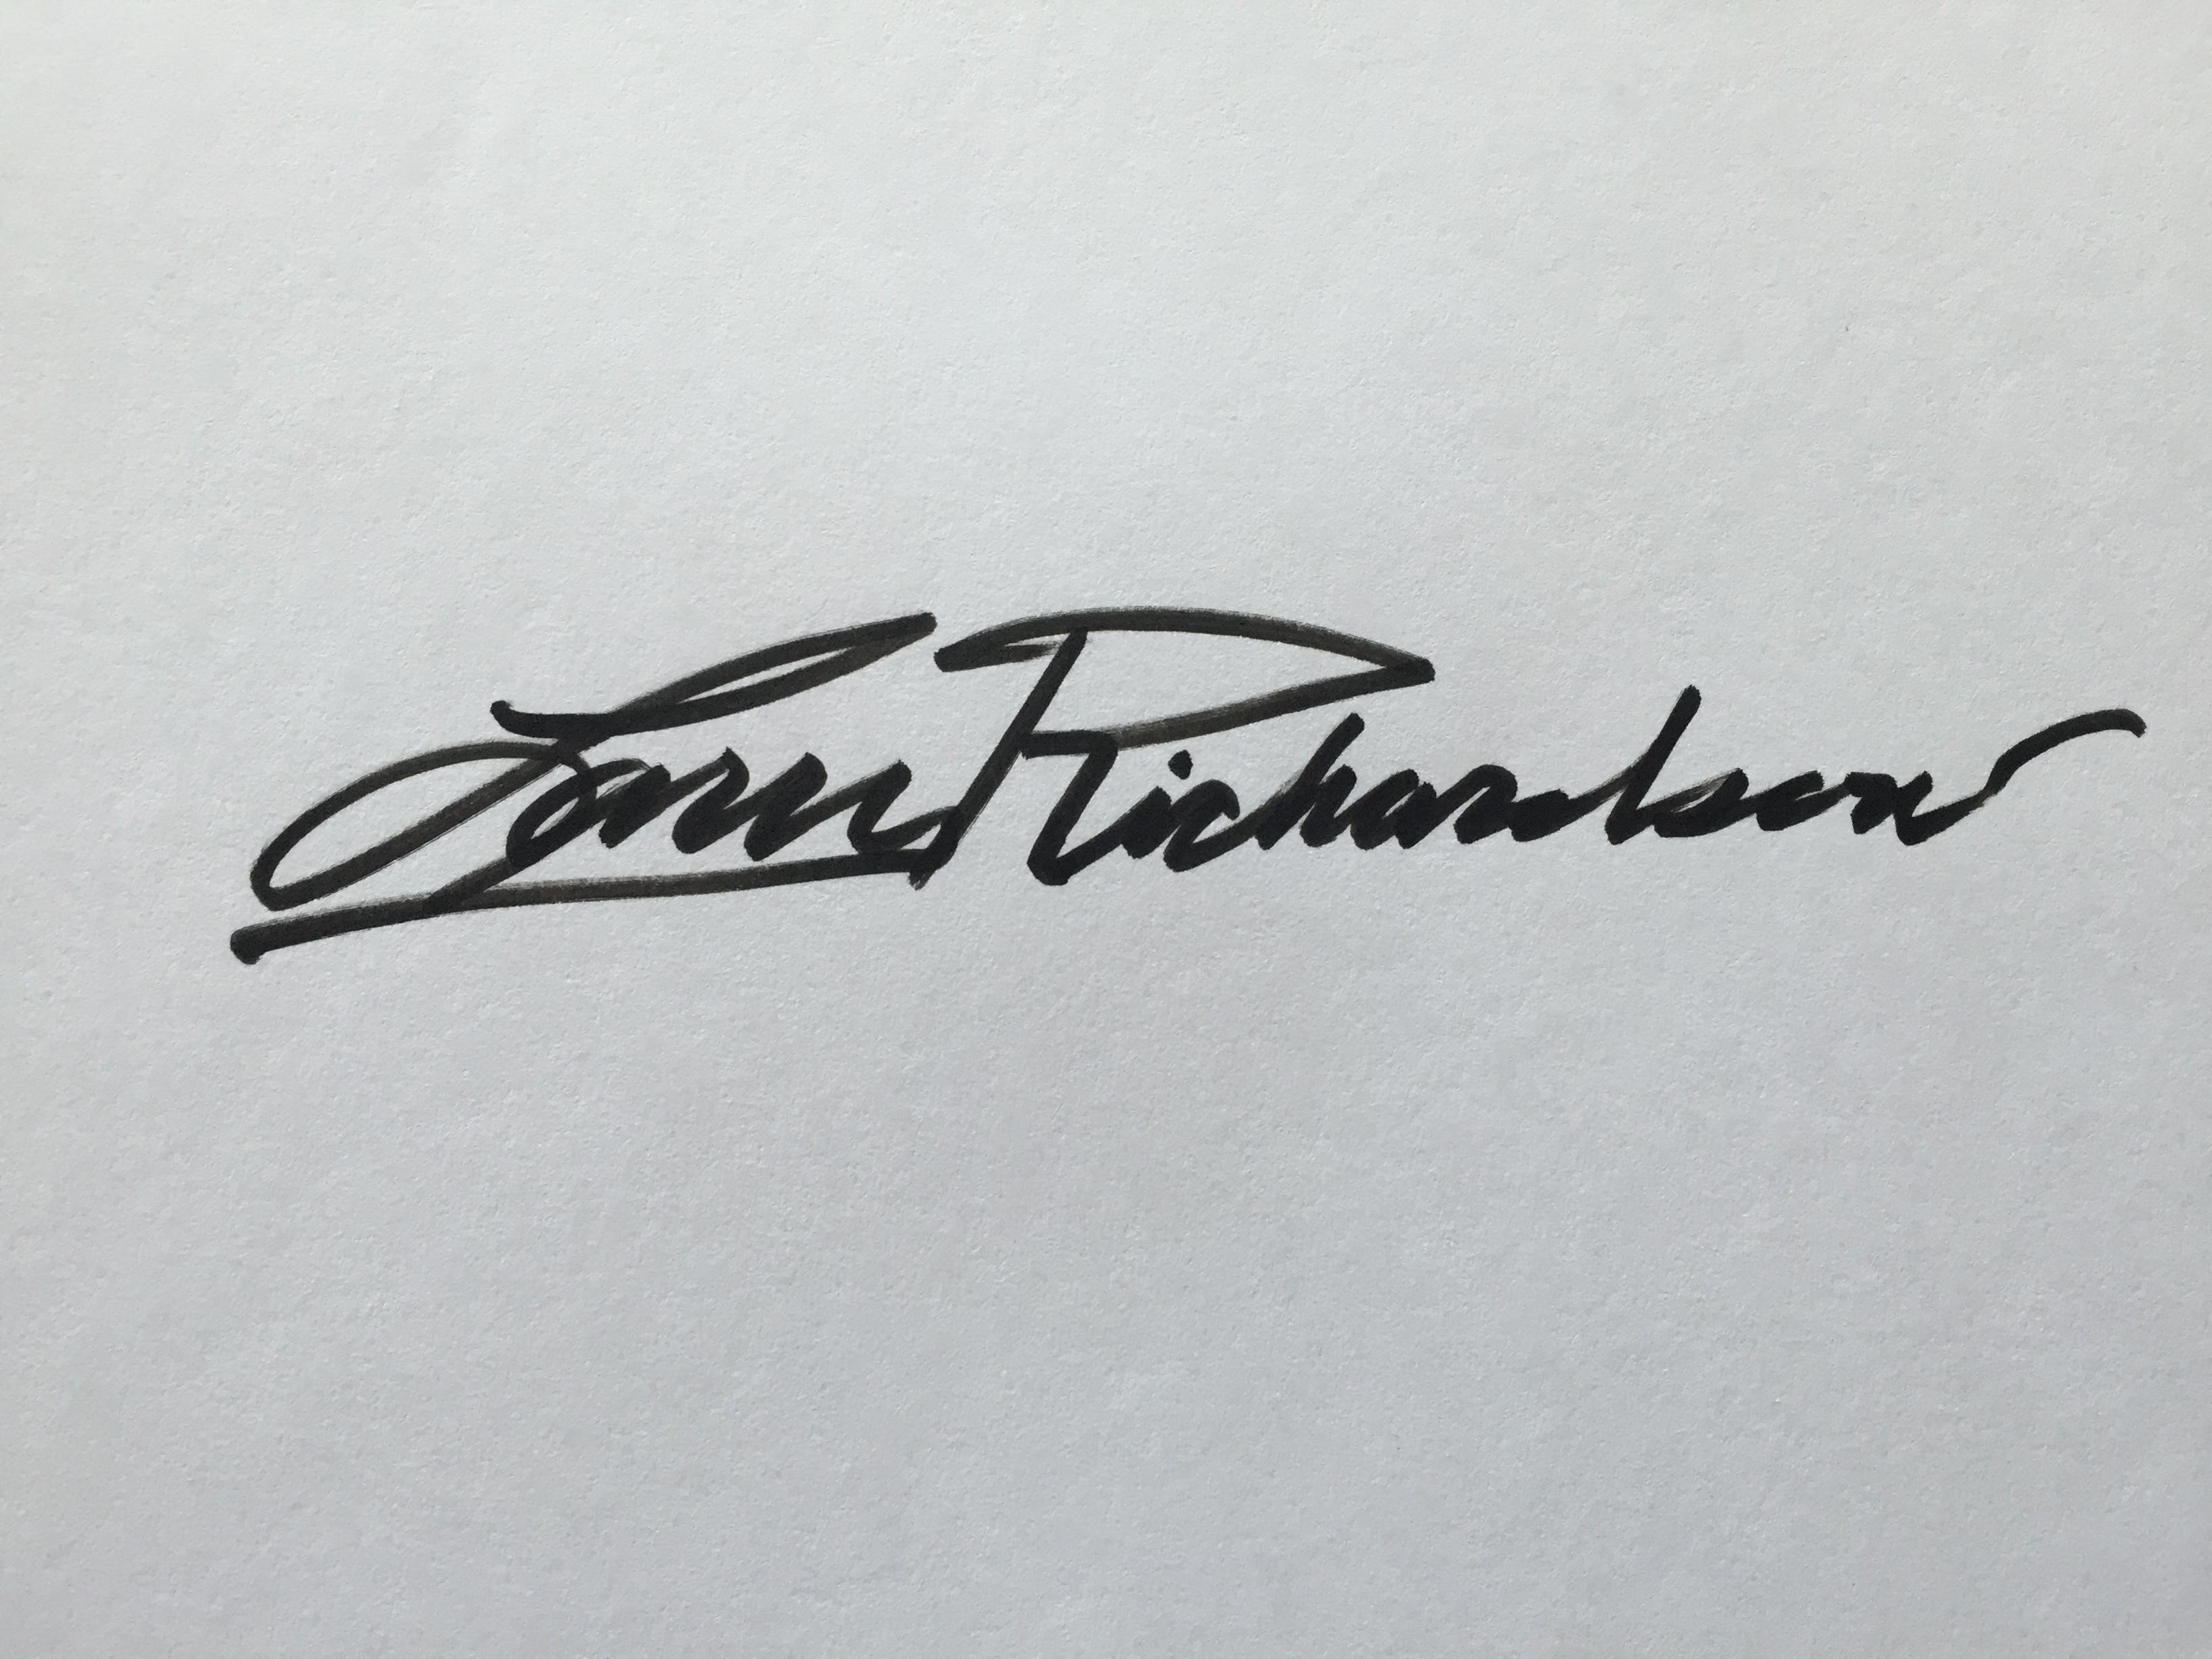 Larry Richardson's Signature